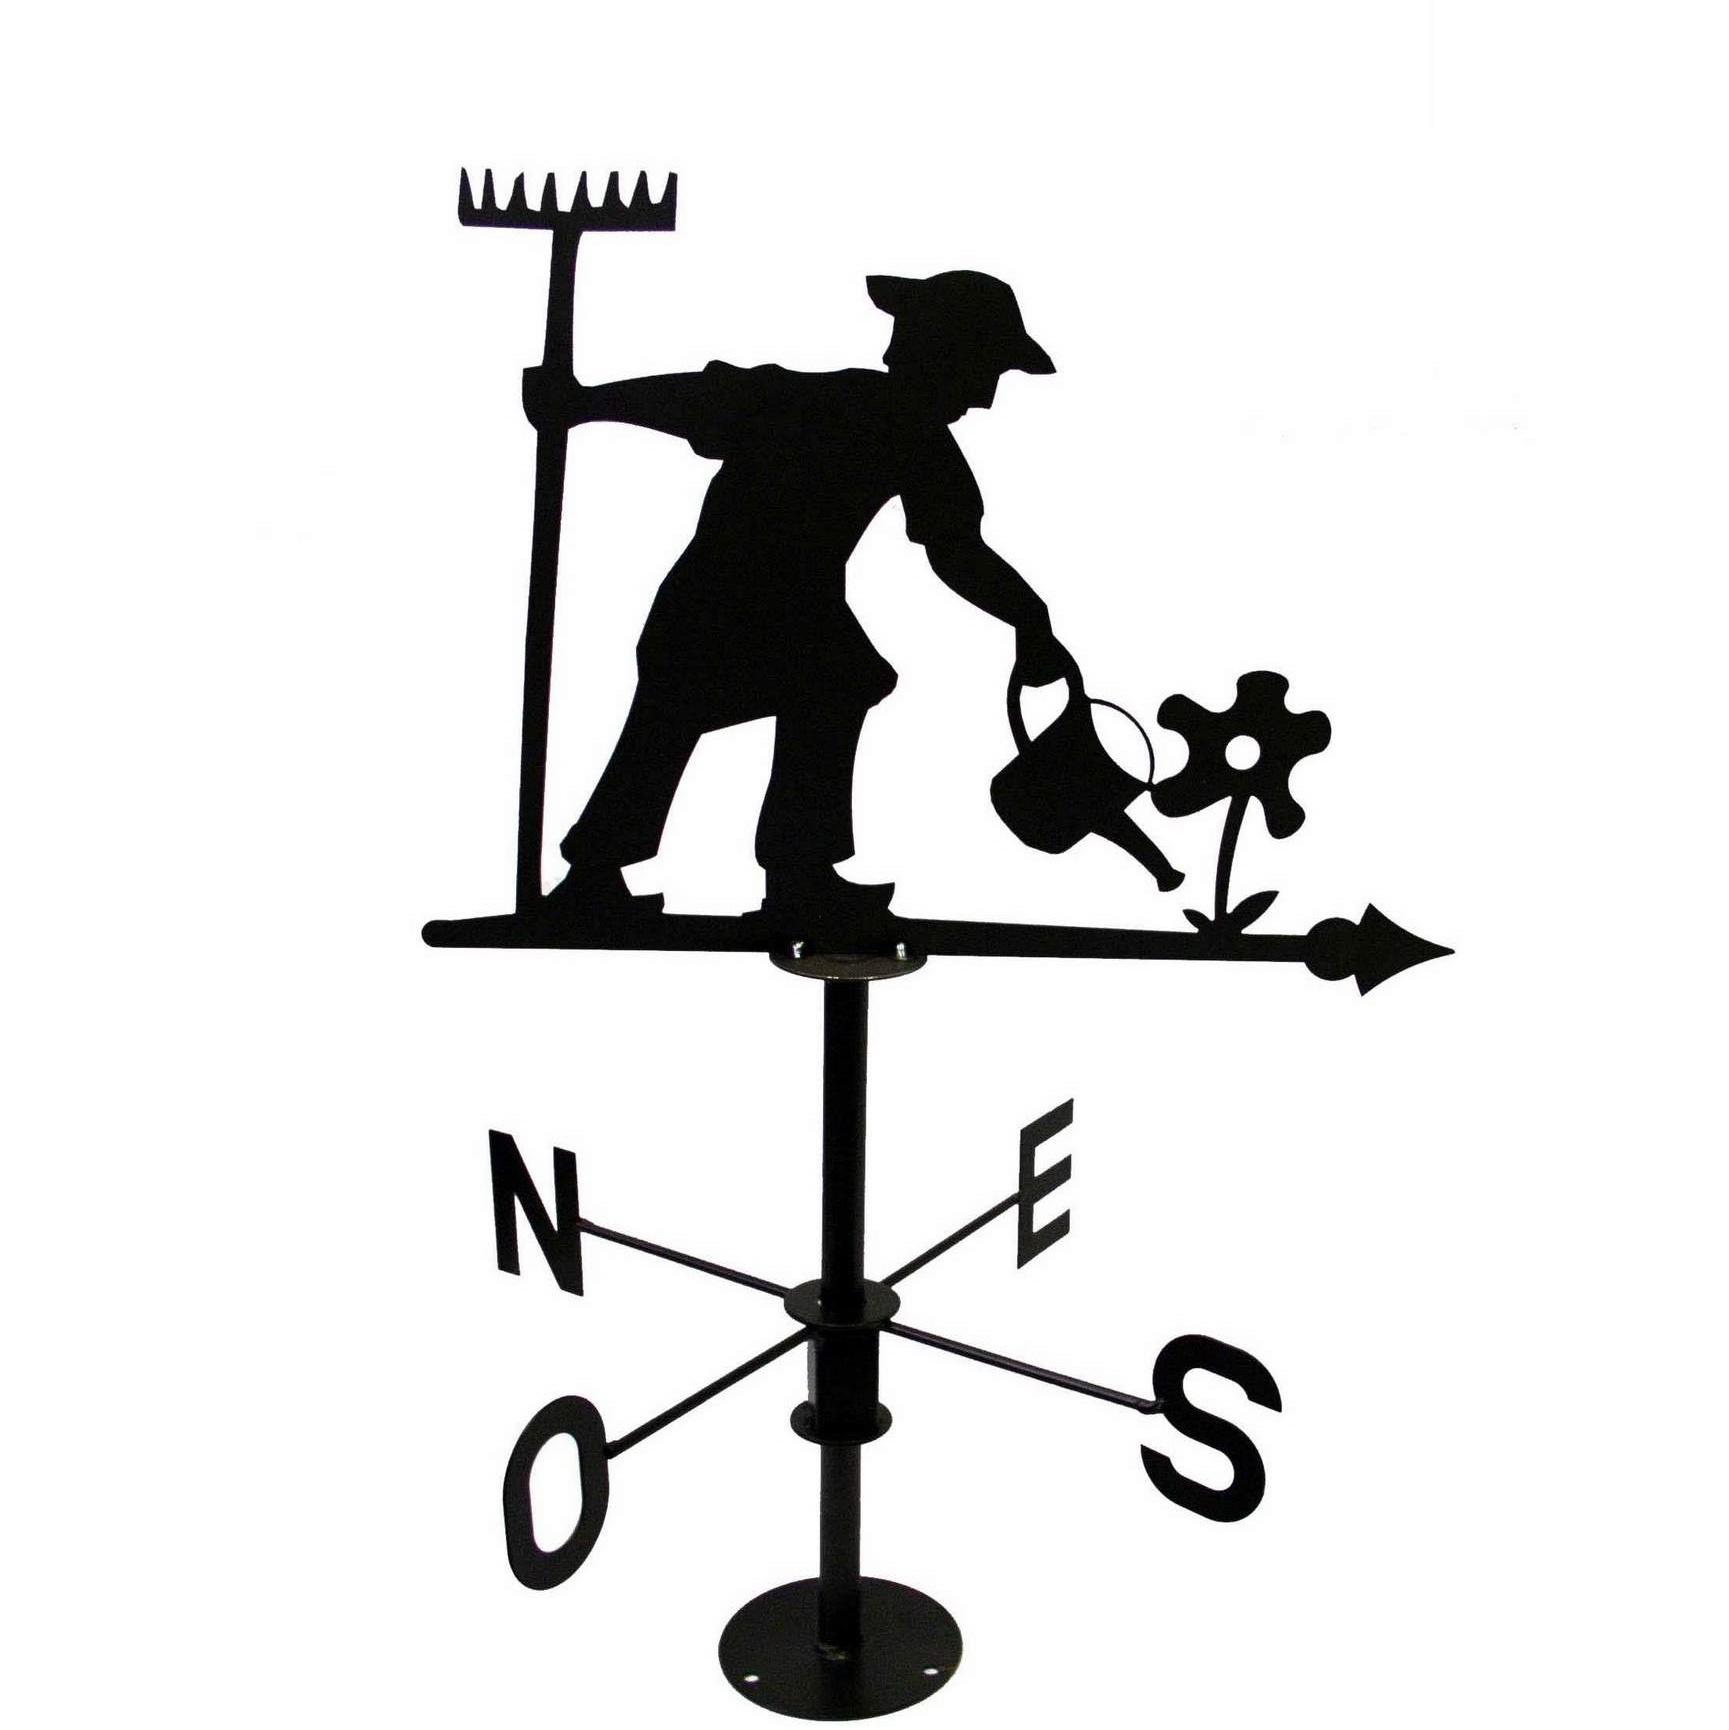 Girouette Jardinier, Gris Métal, Jardifer® concernant Girouette De Jardin